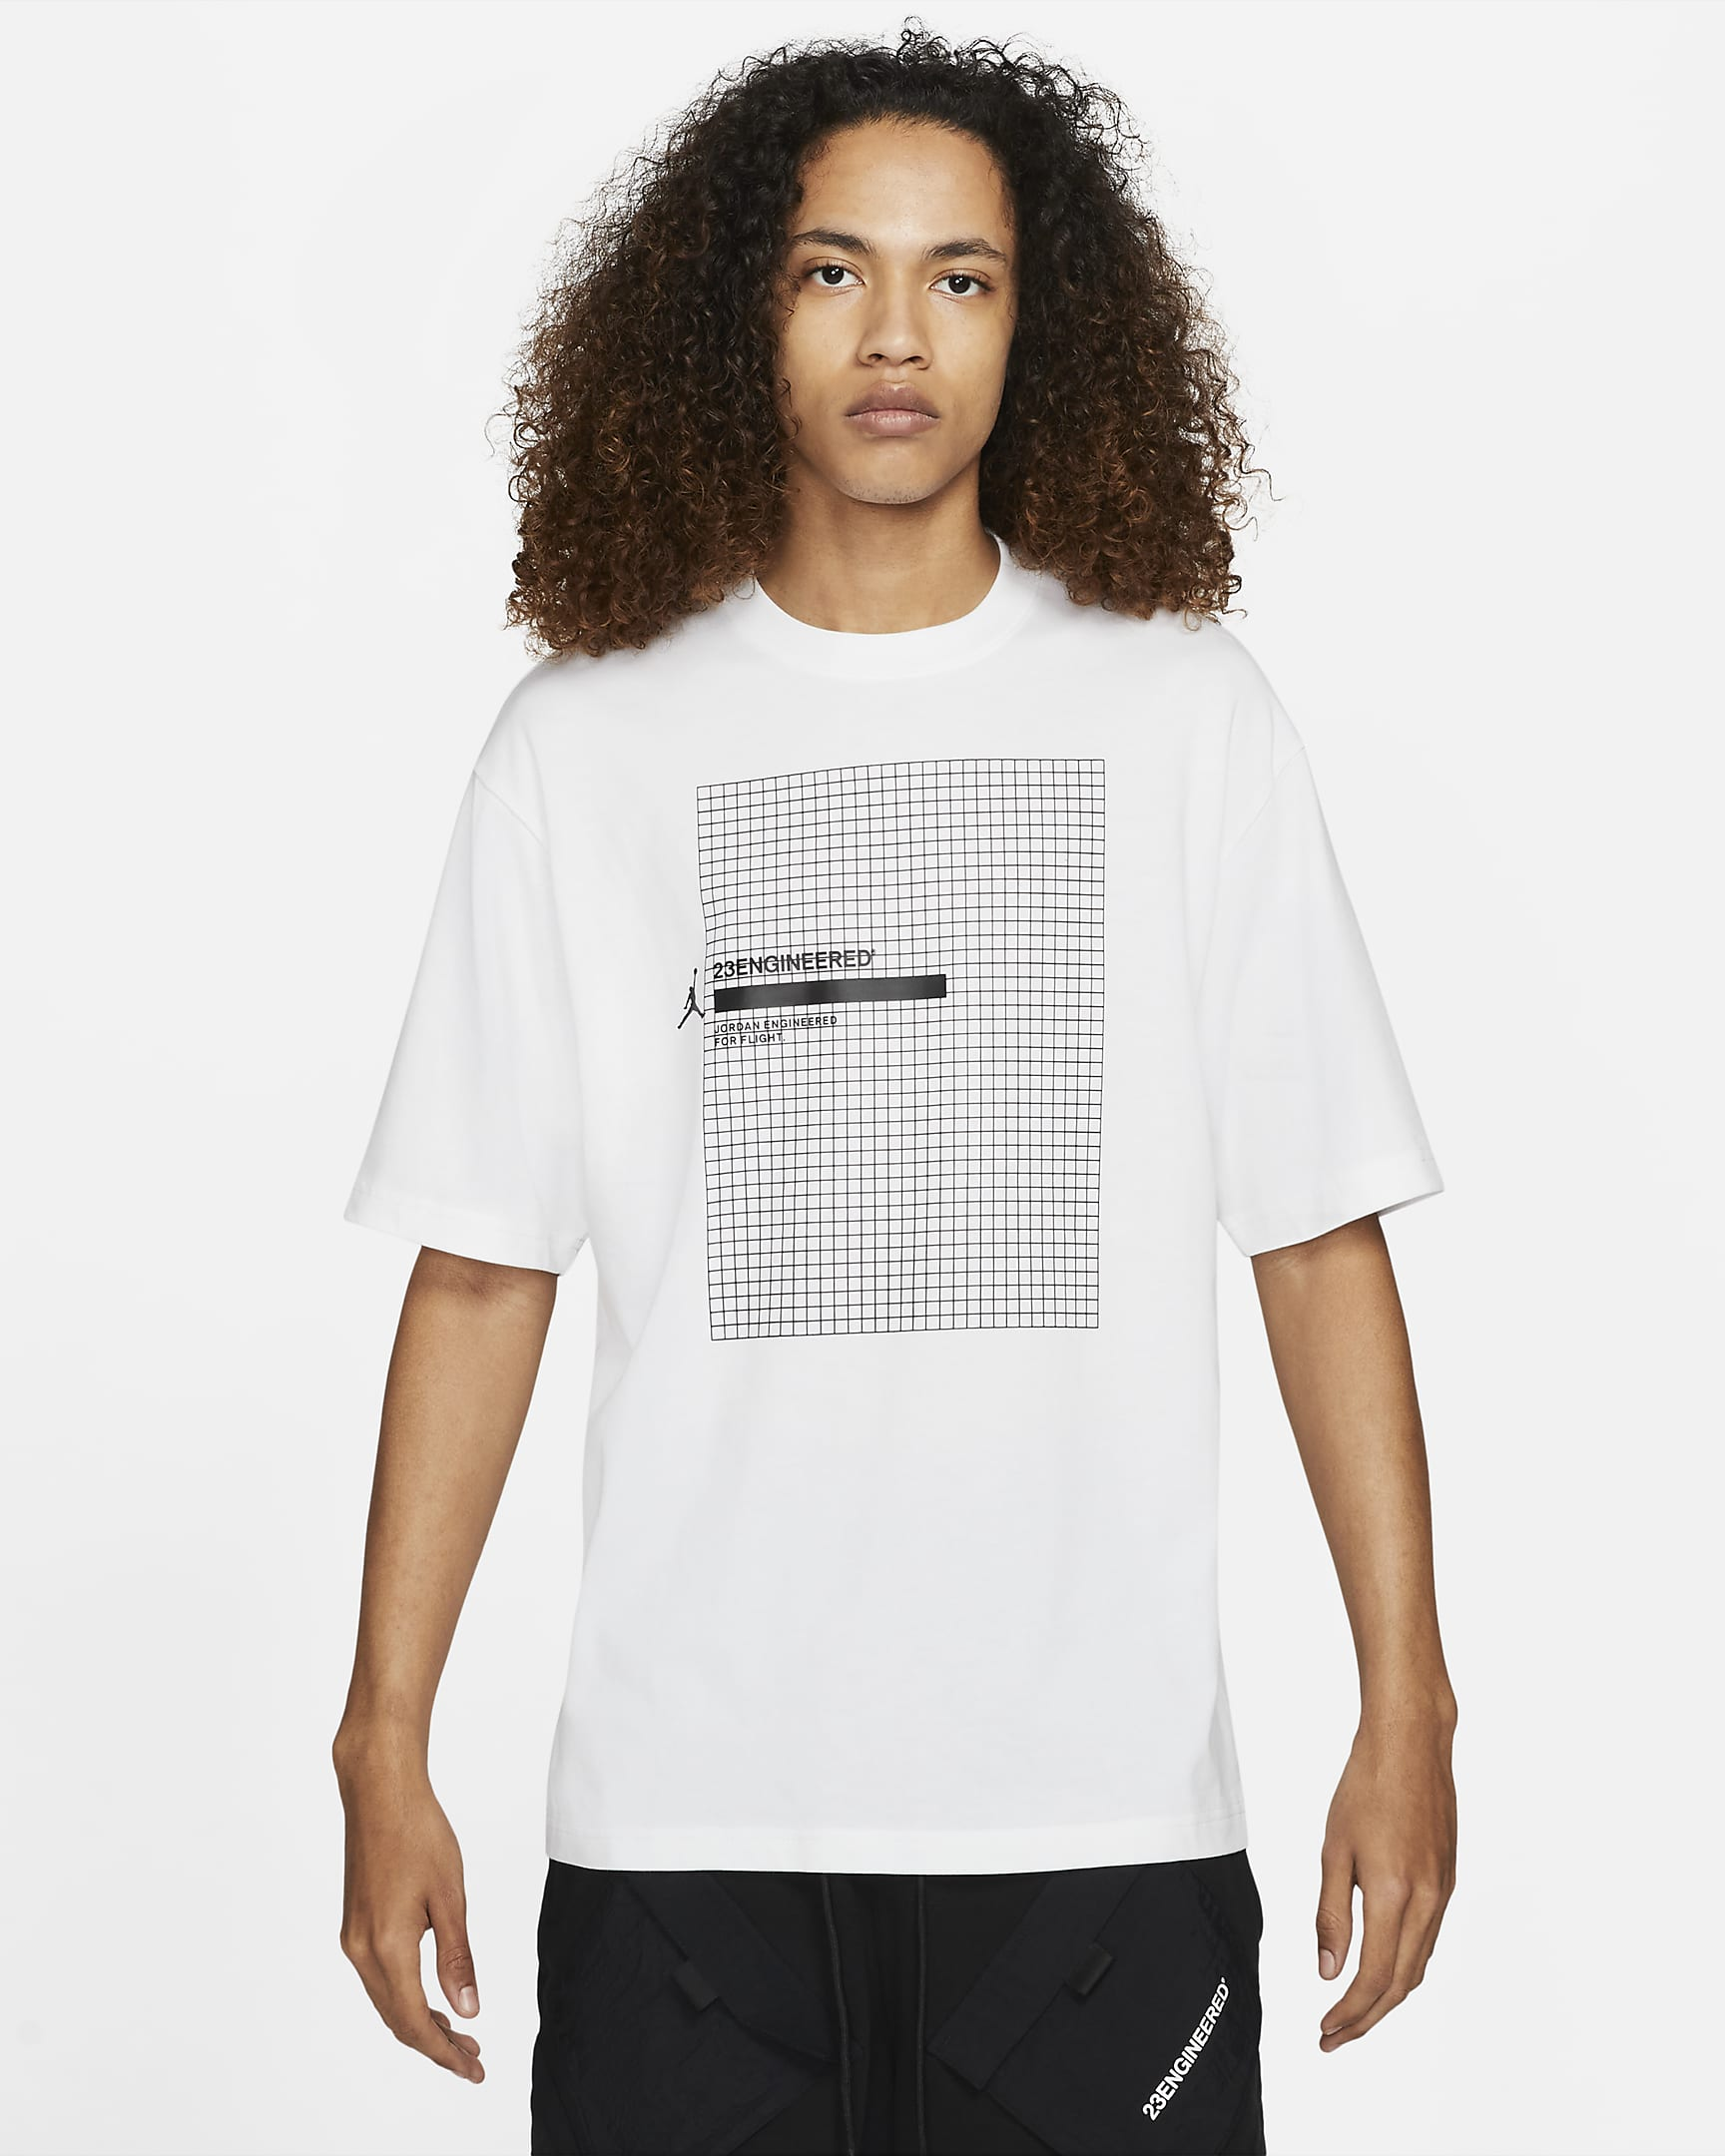 jordan-23-engineered-mens-short-sleeve-t-shirt-WwjbT9-2.png